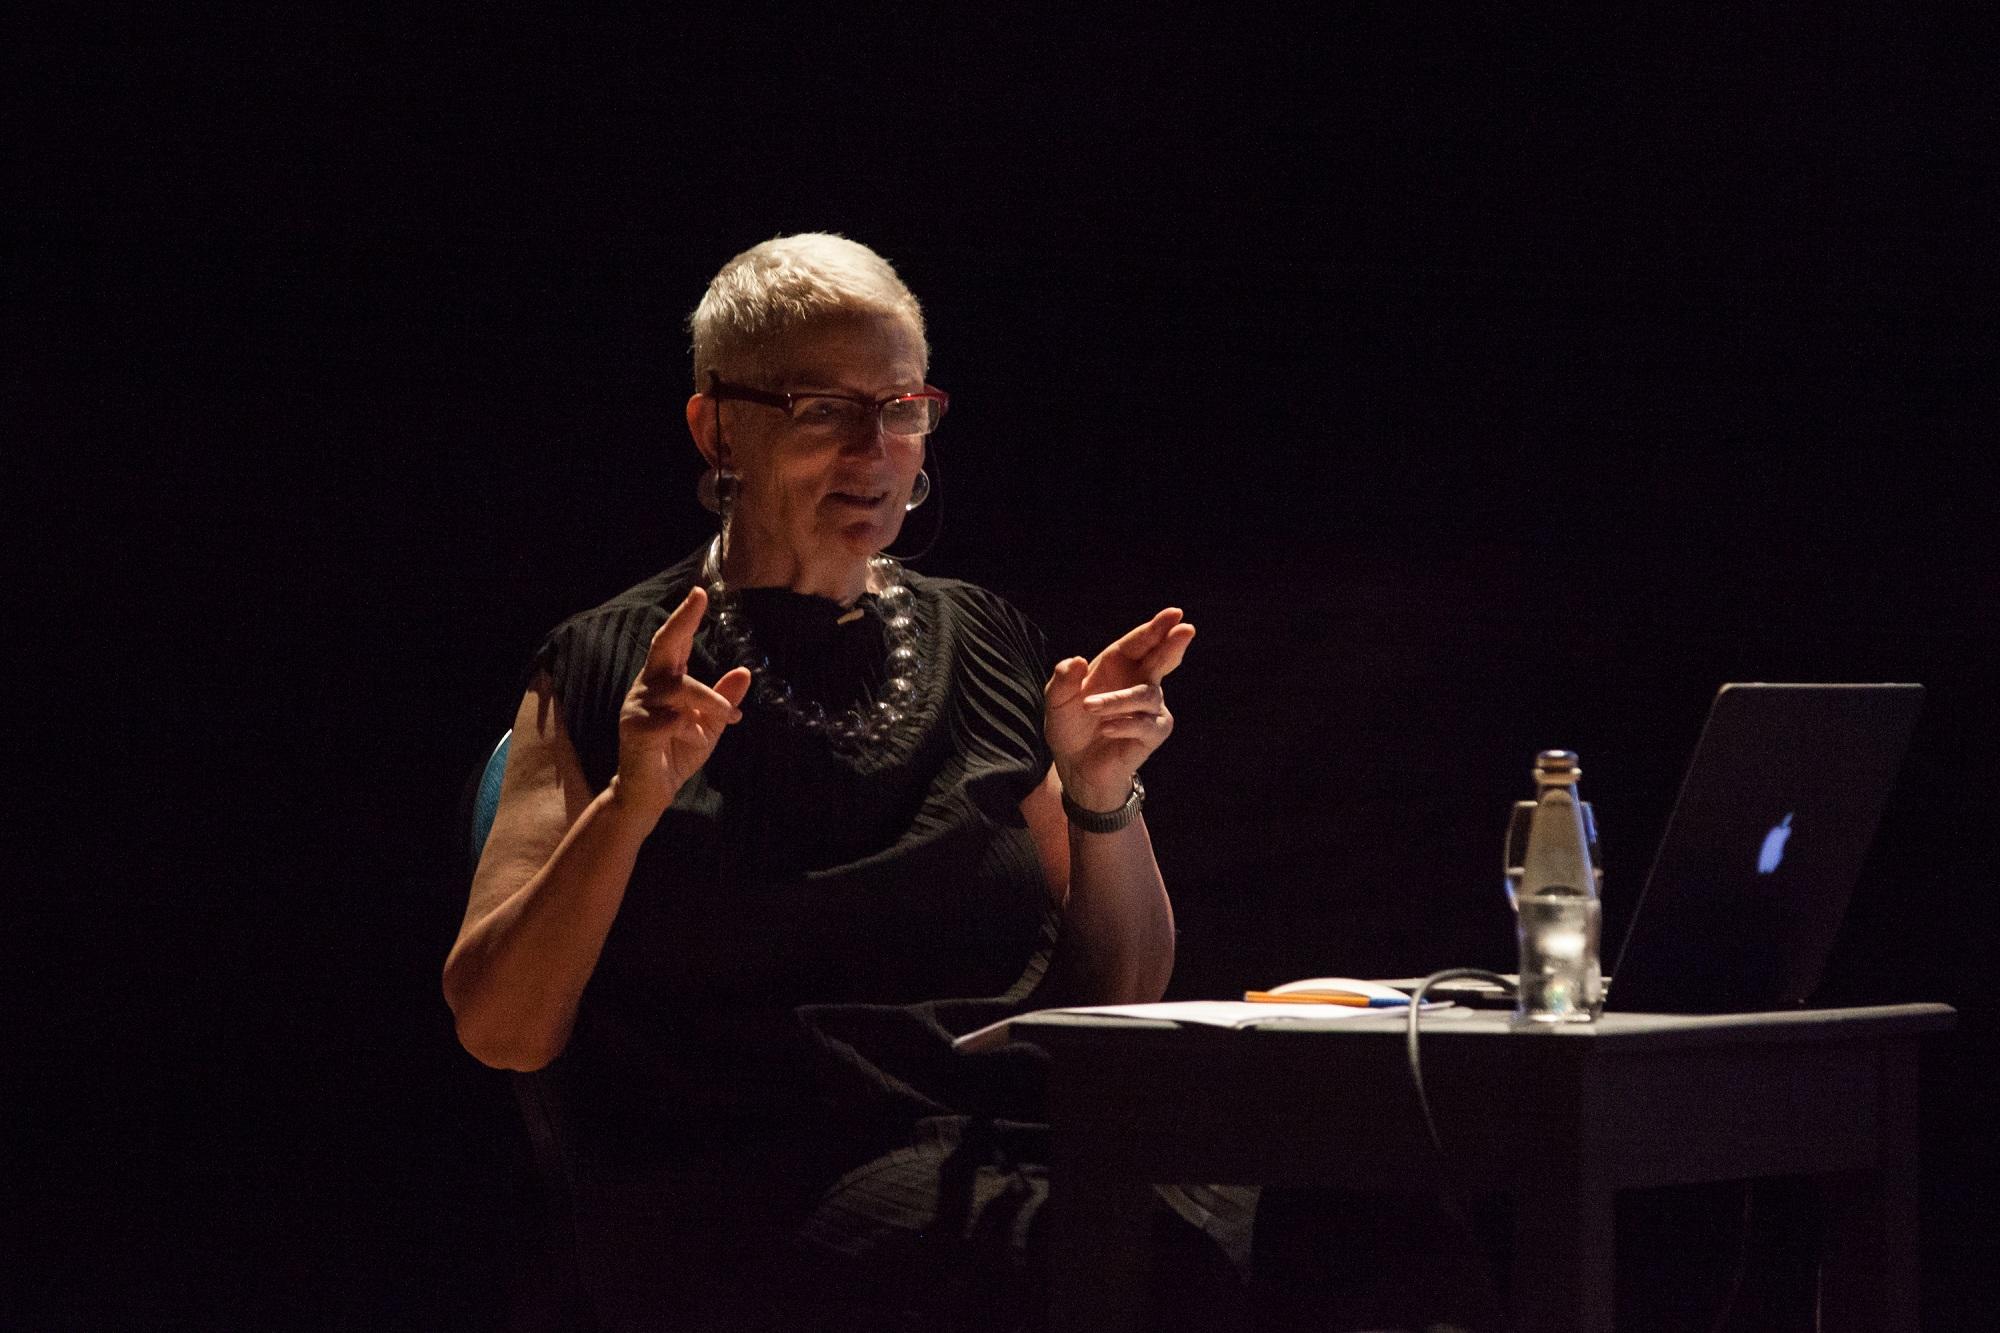 Mieke Bal giving a talk at last year's edition of VIVA. Photo: Elisa von Brockdorff